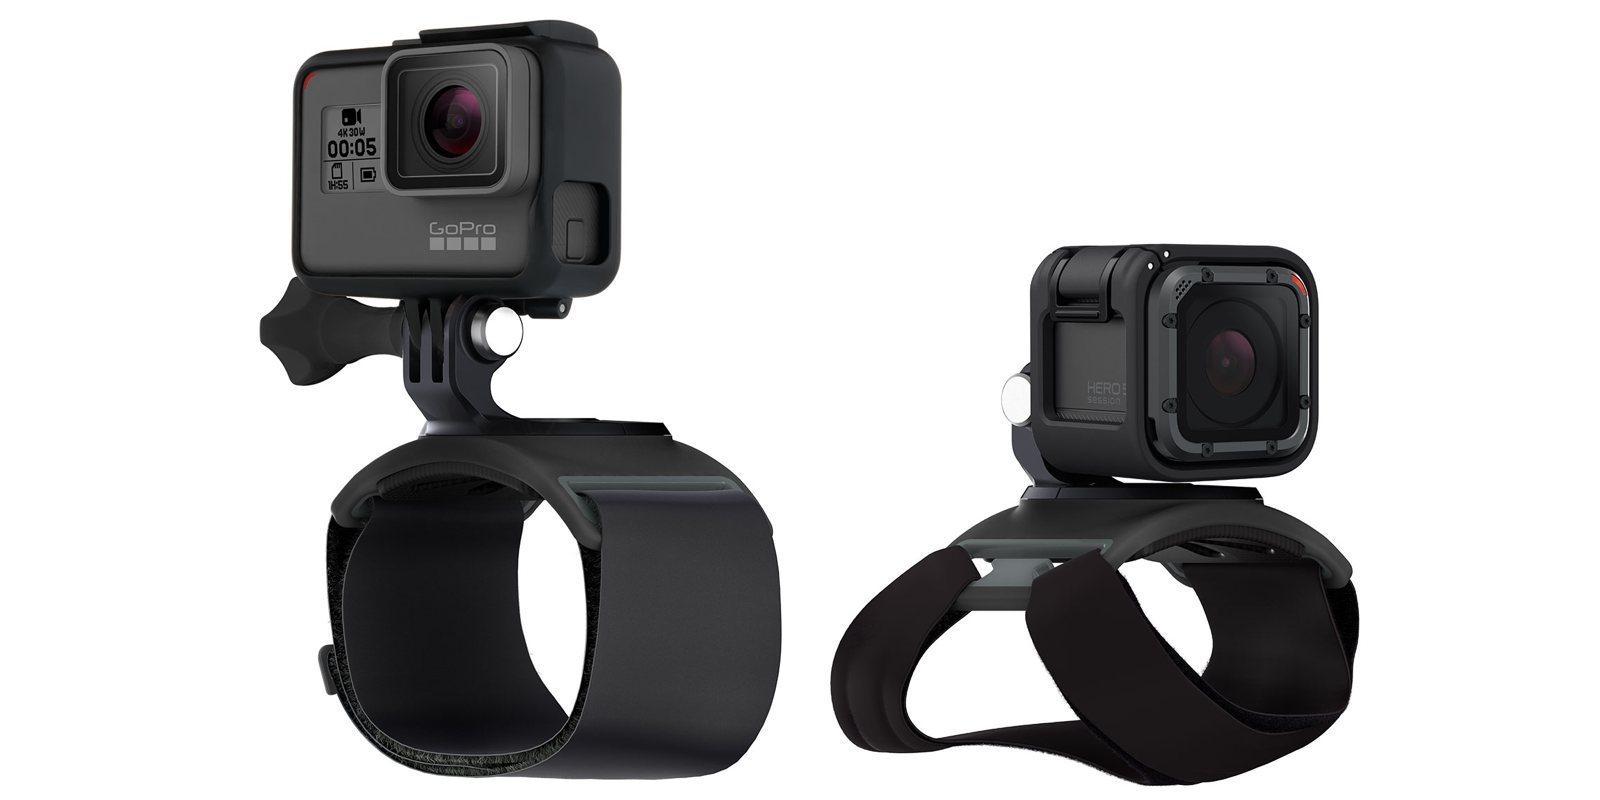 Крепление на руку GoPro Hand + Wrist Strap (AHWBM-002) варианты